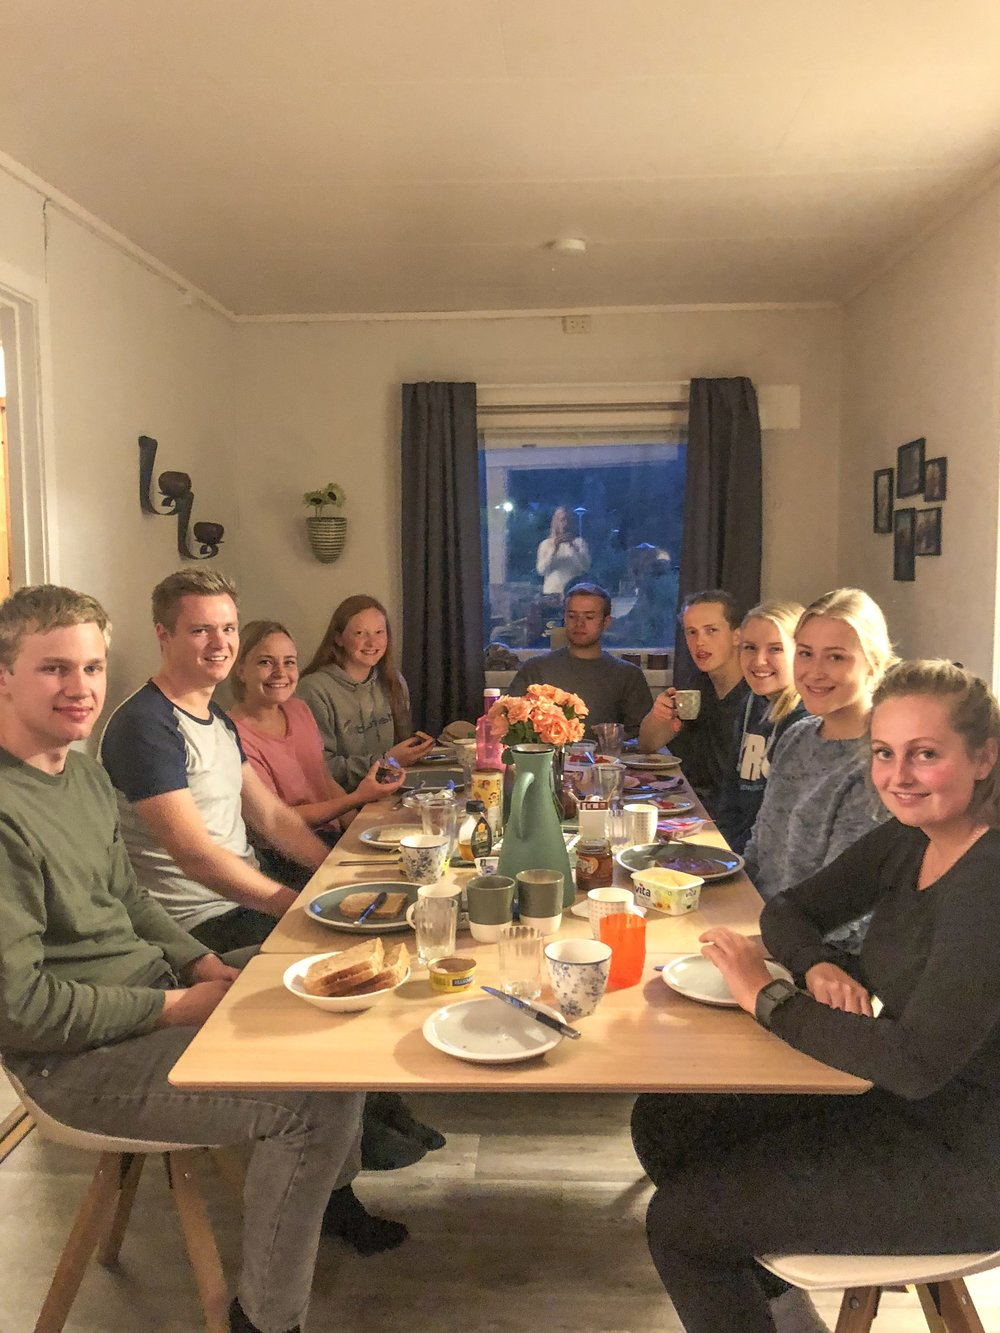 Bibelgruppe hjemme hos stab